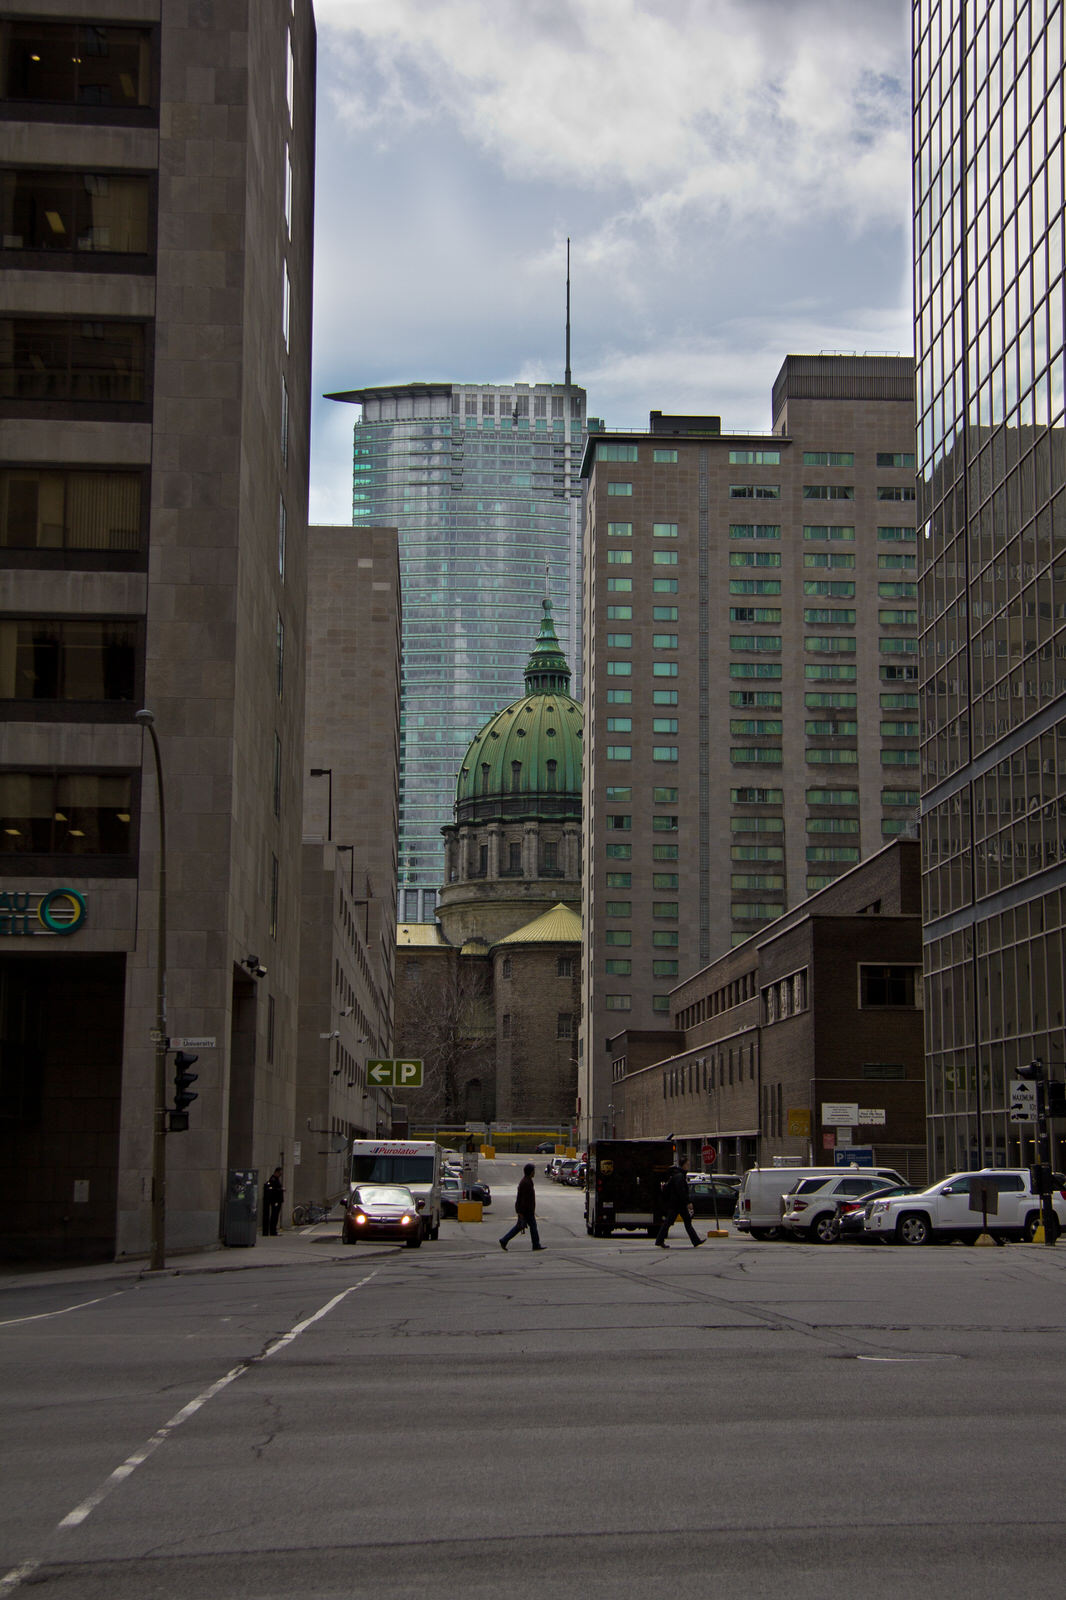 Montréal Streets - Old and new - Visuelles Logbuch